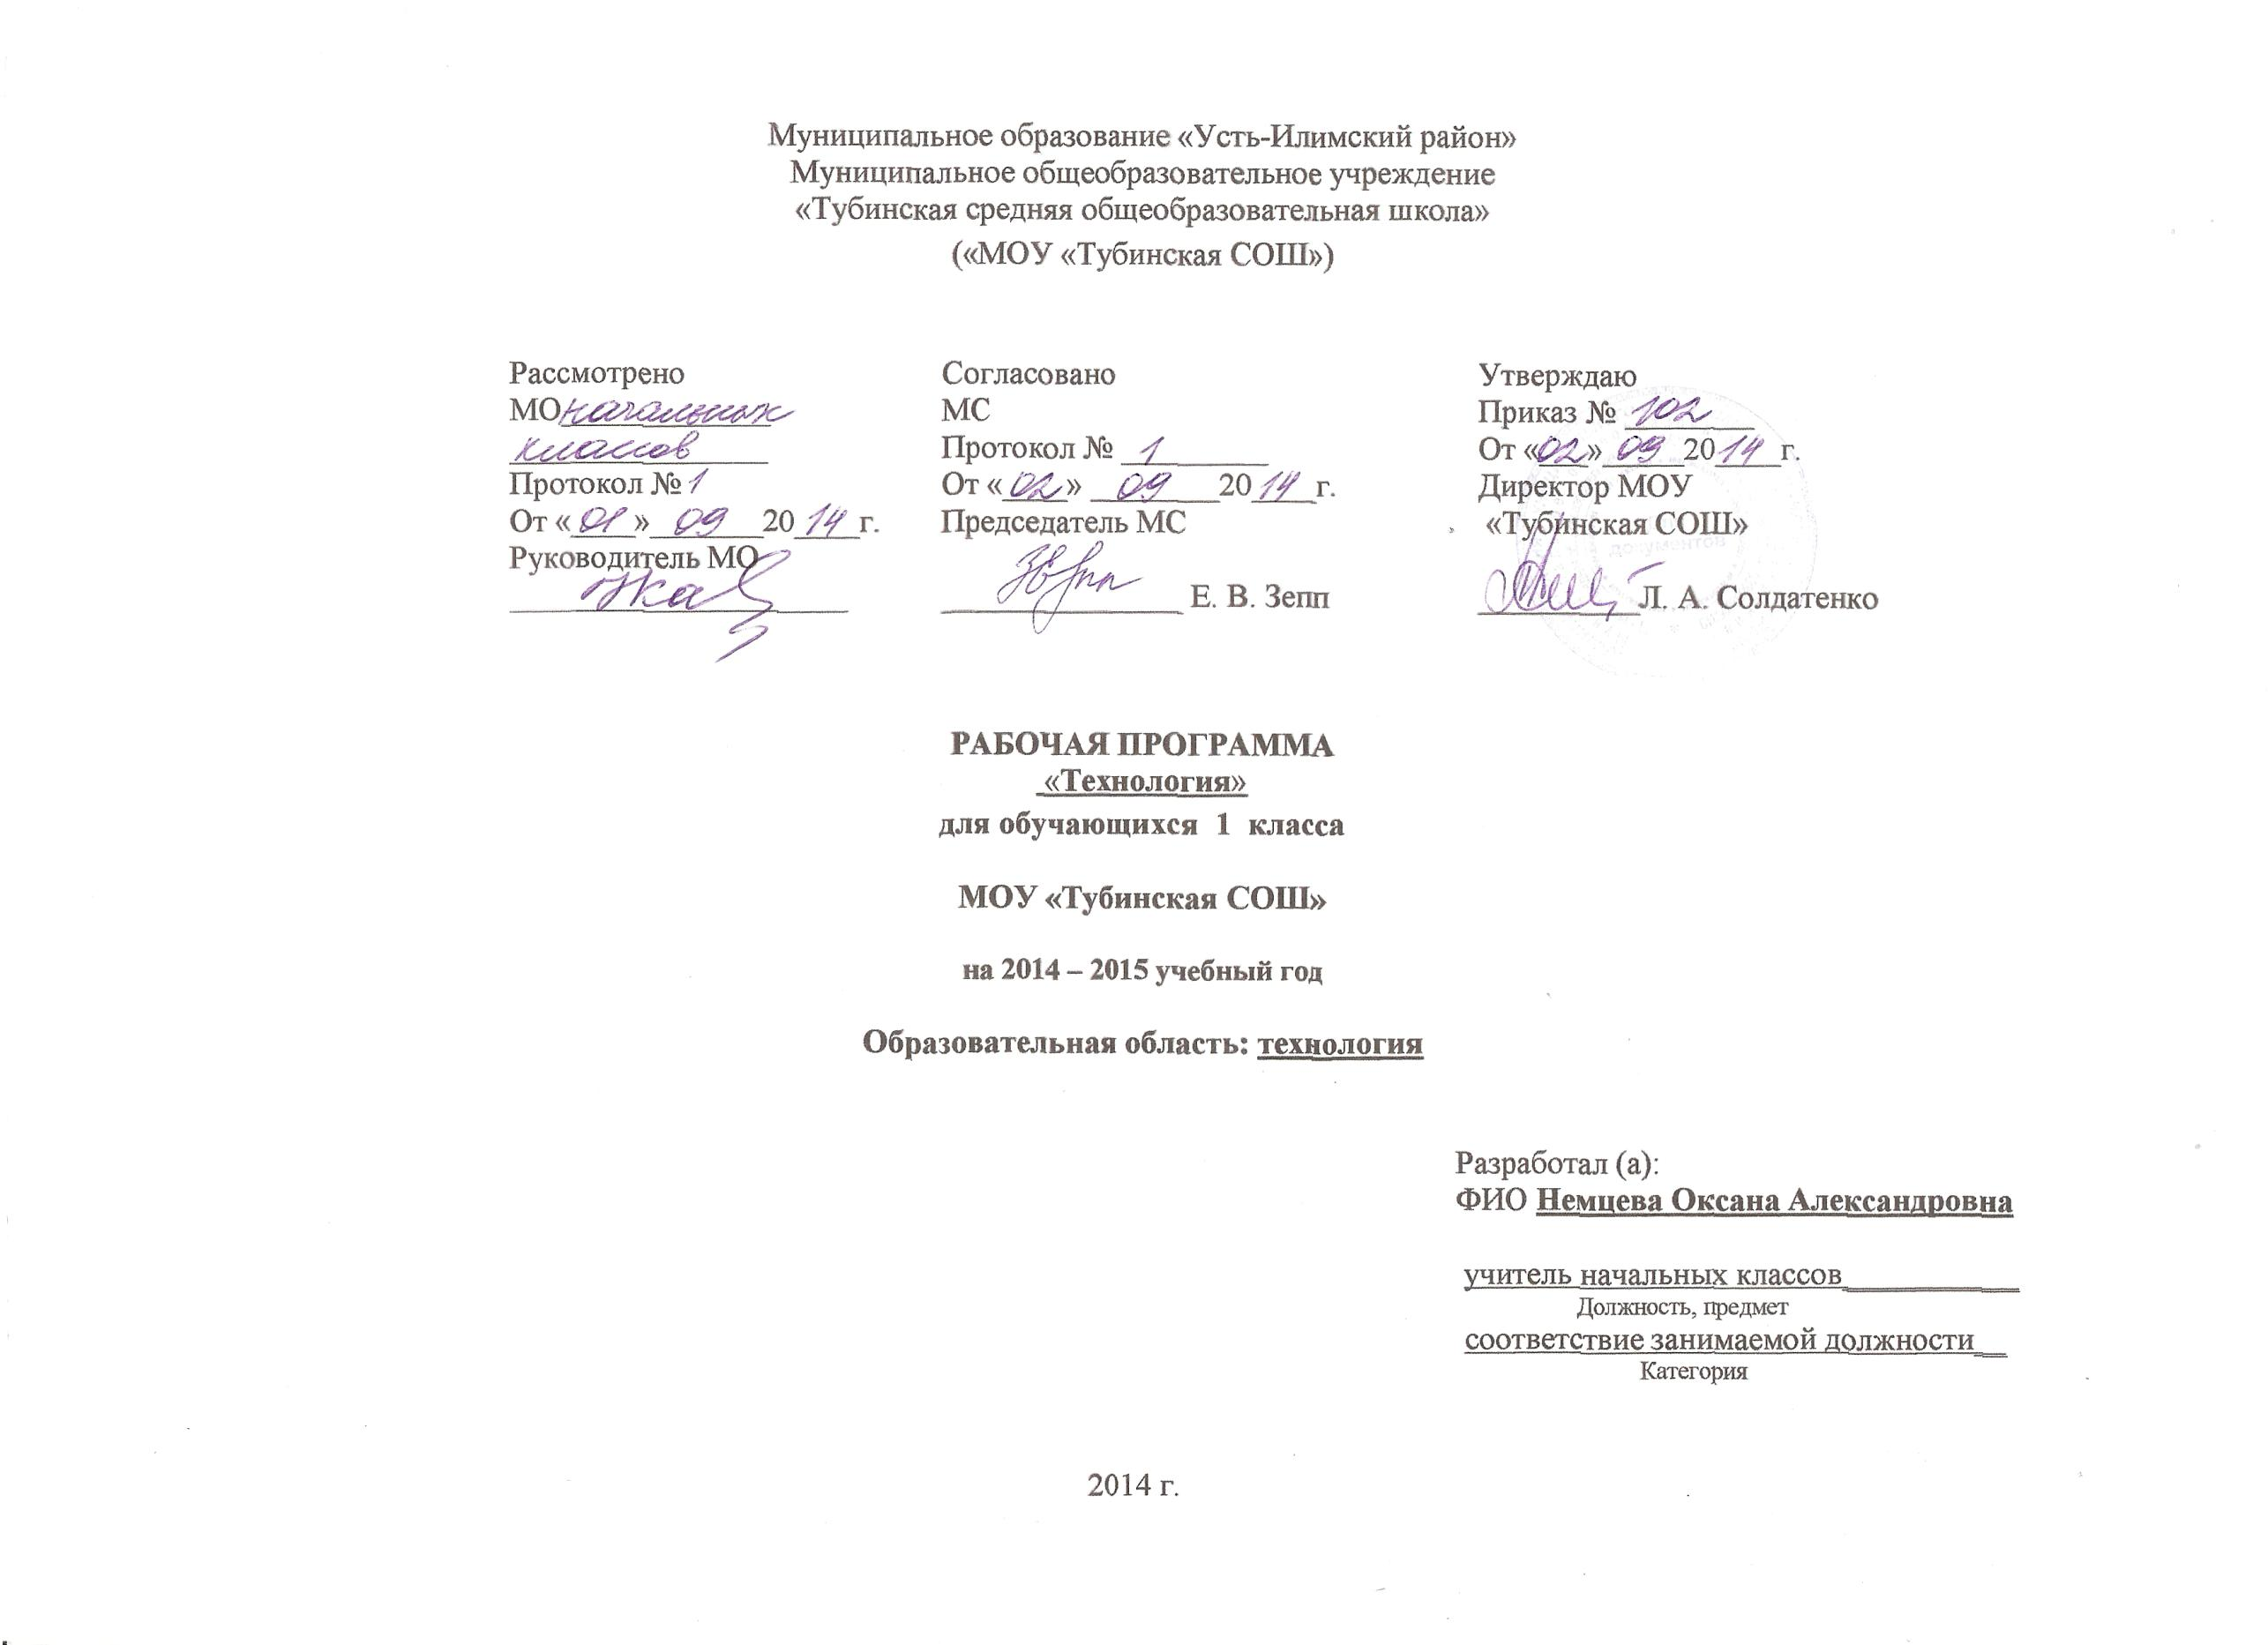 I:\Documents and Settings\User\Рабочий стол\иии.tif